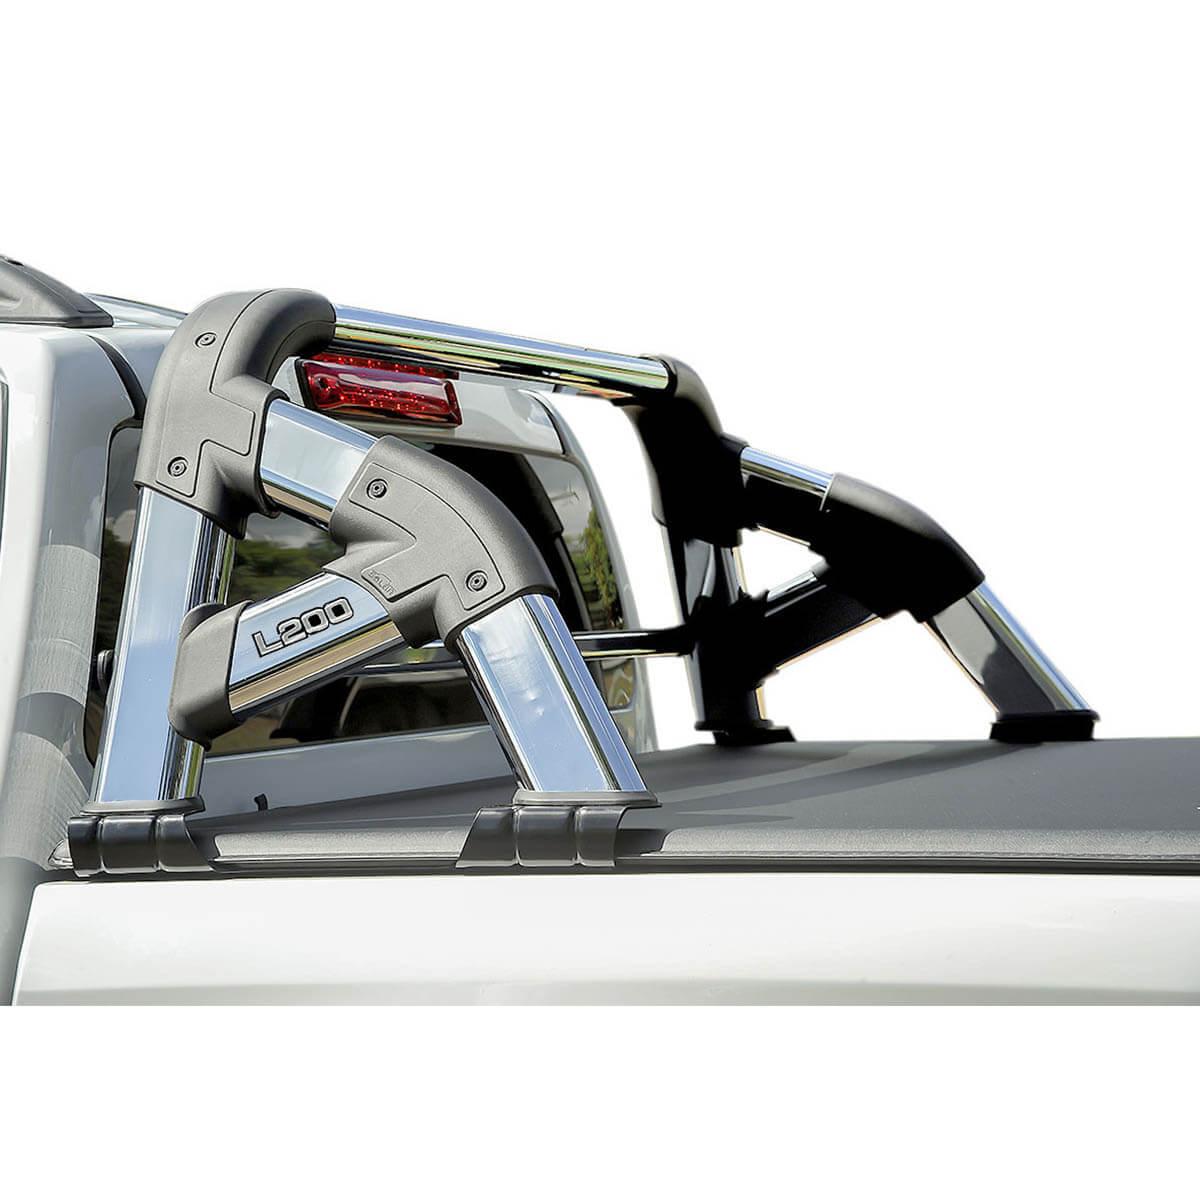 Santo antônio Solar Exclusive cromado L200 Sport 2004 a 2007 ou L200 Outdoor 2007 a 2012 com barra de vidro